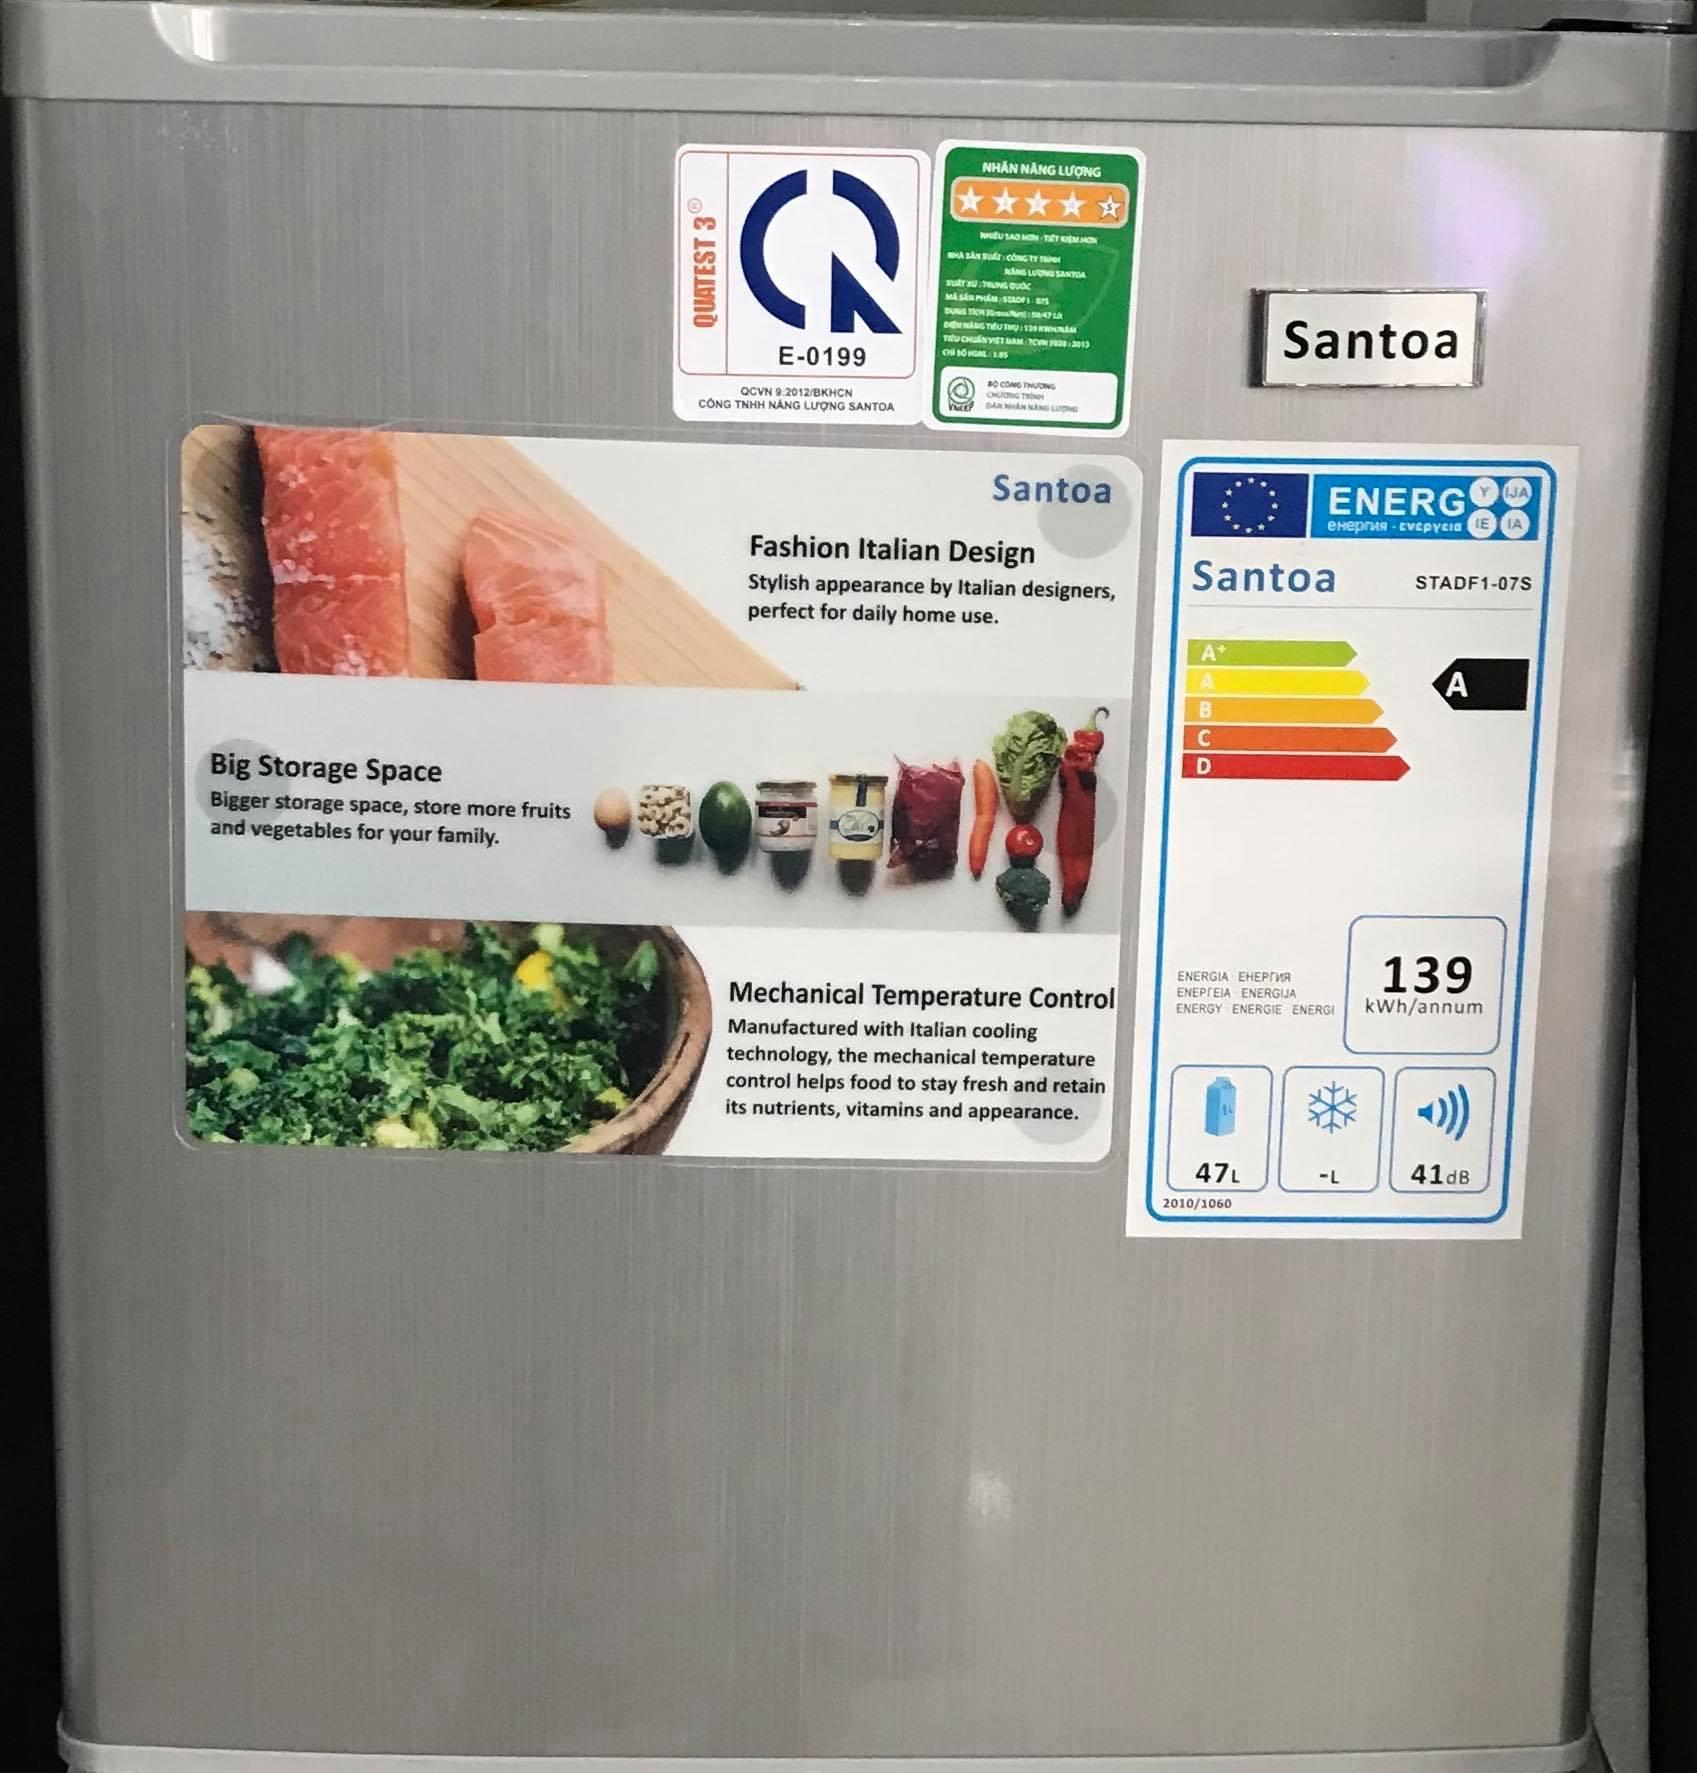 Hình ảnh Tủ Lạnh Mini Santoa - Model STADF1 - 07 (48L)